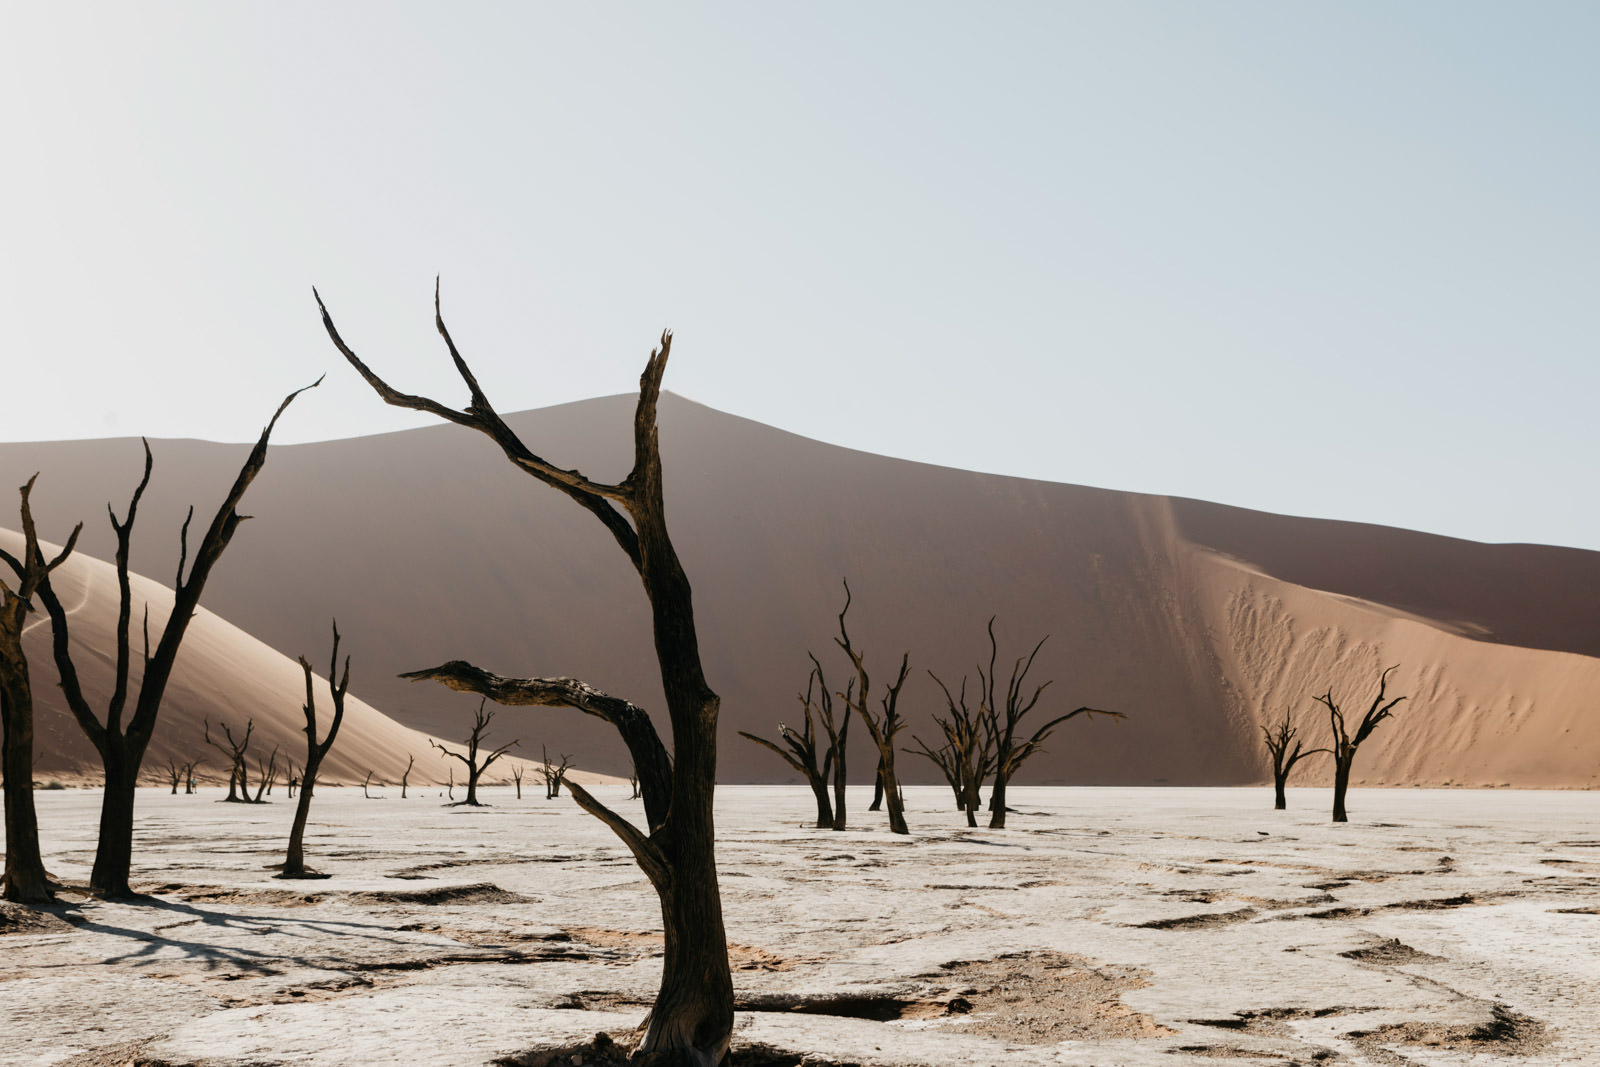 namibia_trip_rooftent_camping_roadtrip (16 von 26).jpg